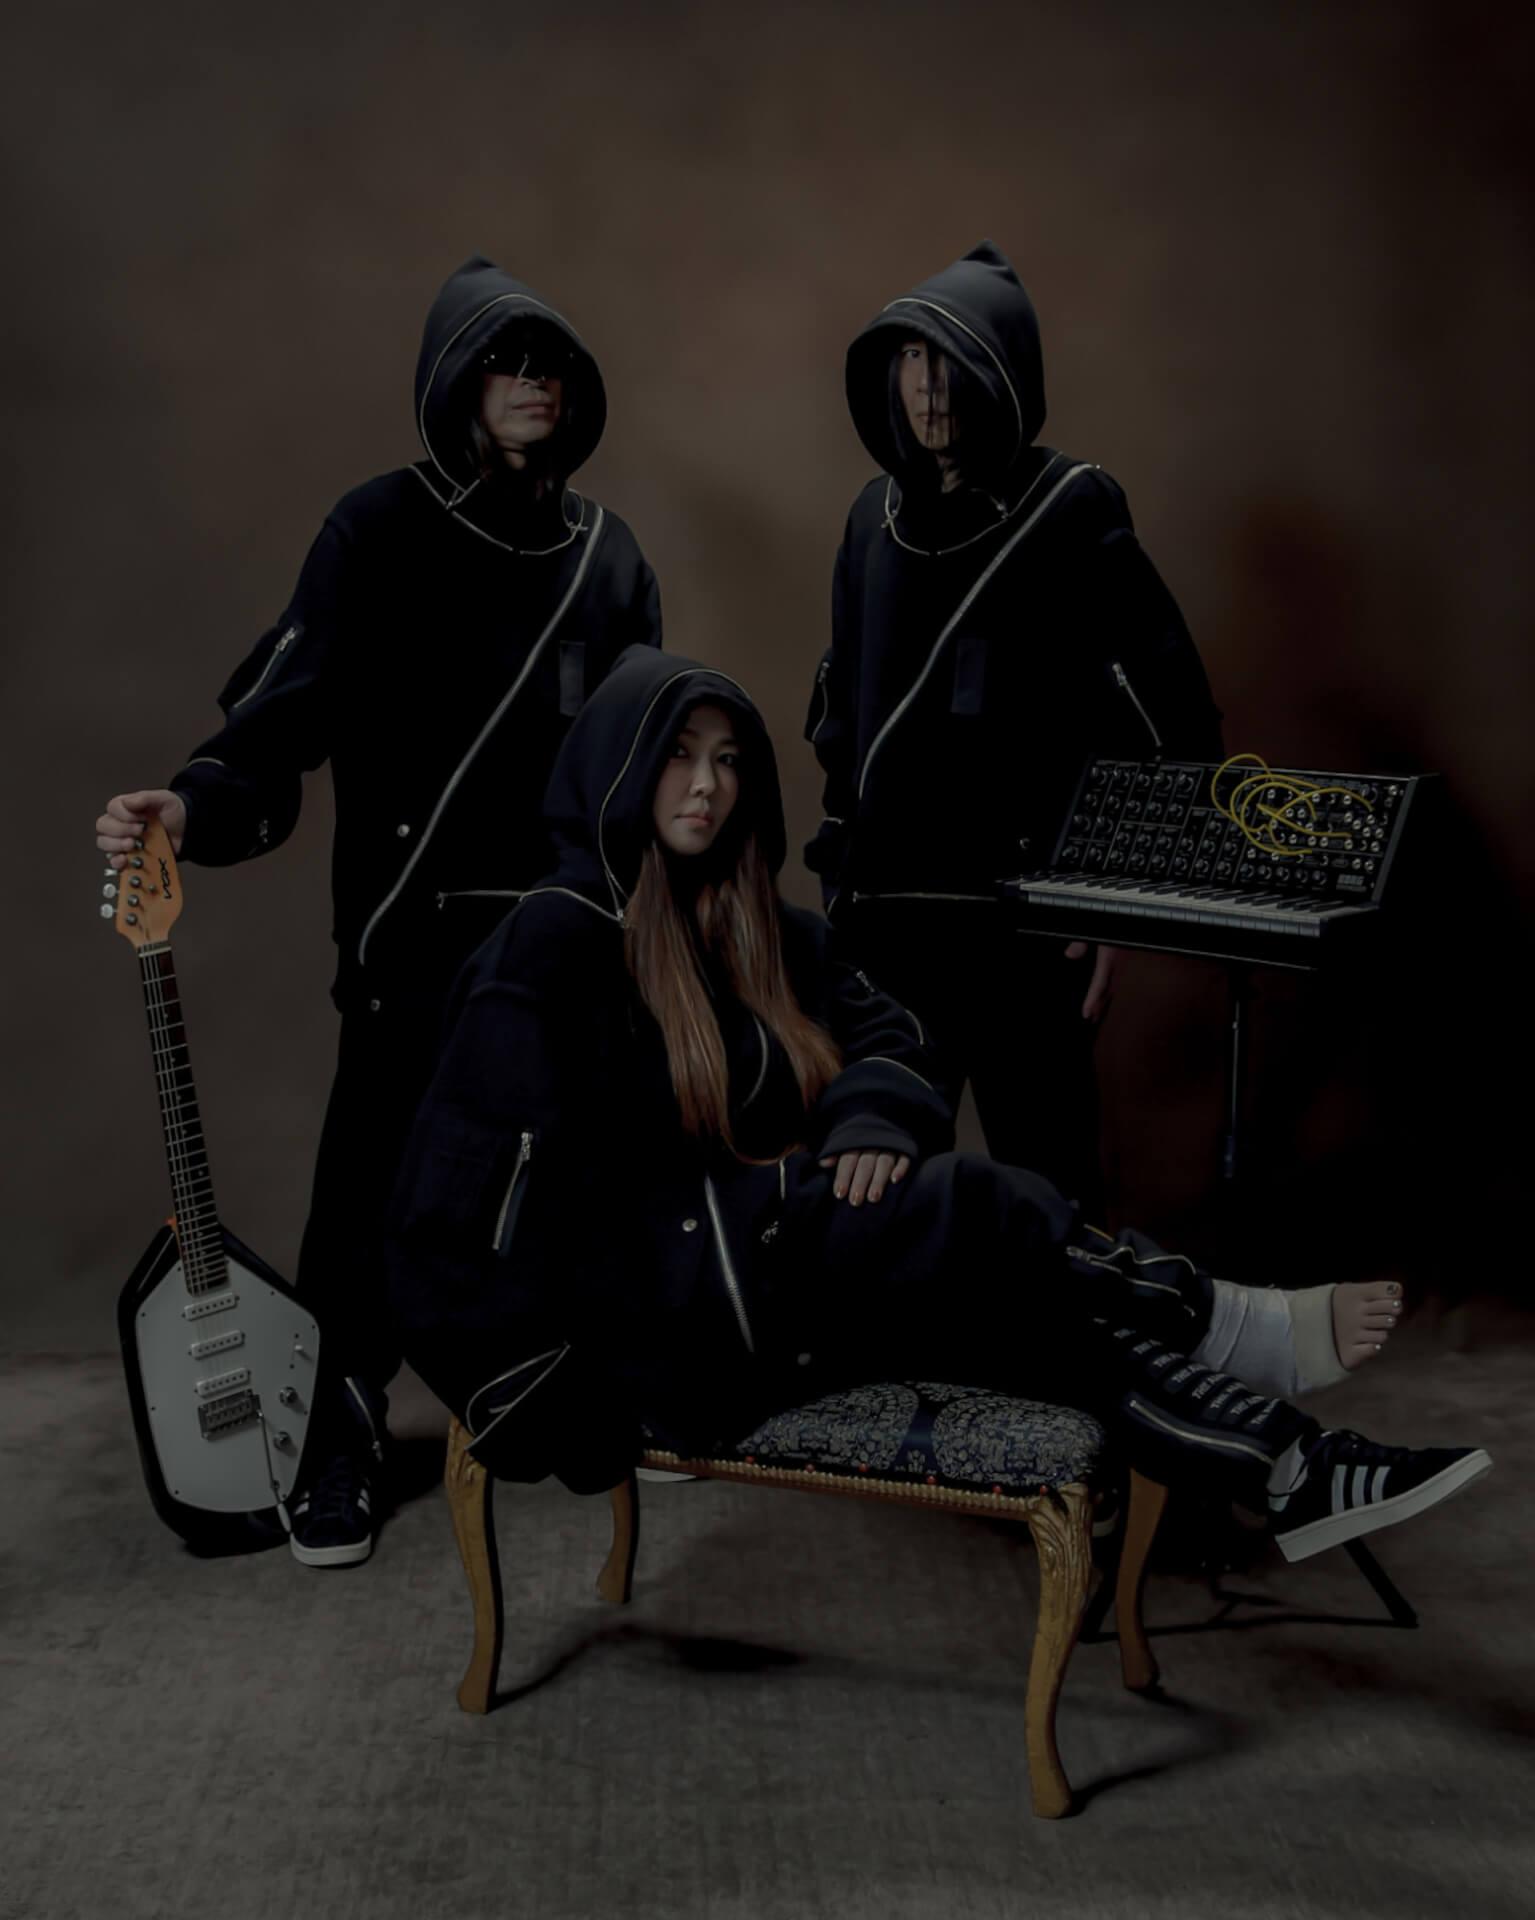 2ndアルバム『God Bless You』をリリースするTHE ALEXXがSUPER DOMMUNEで全曲ライブに挑戦! music210803_thealexx_superdommune_2